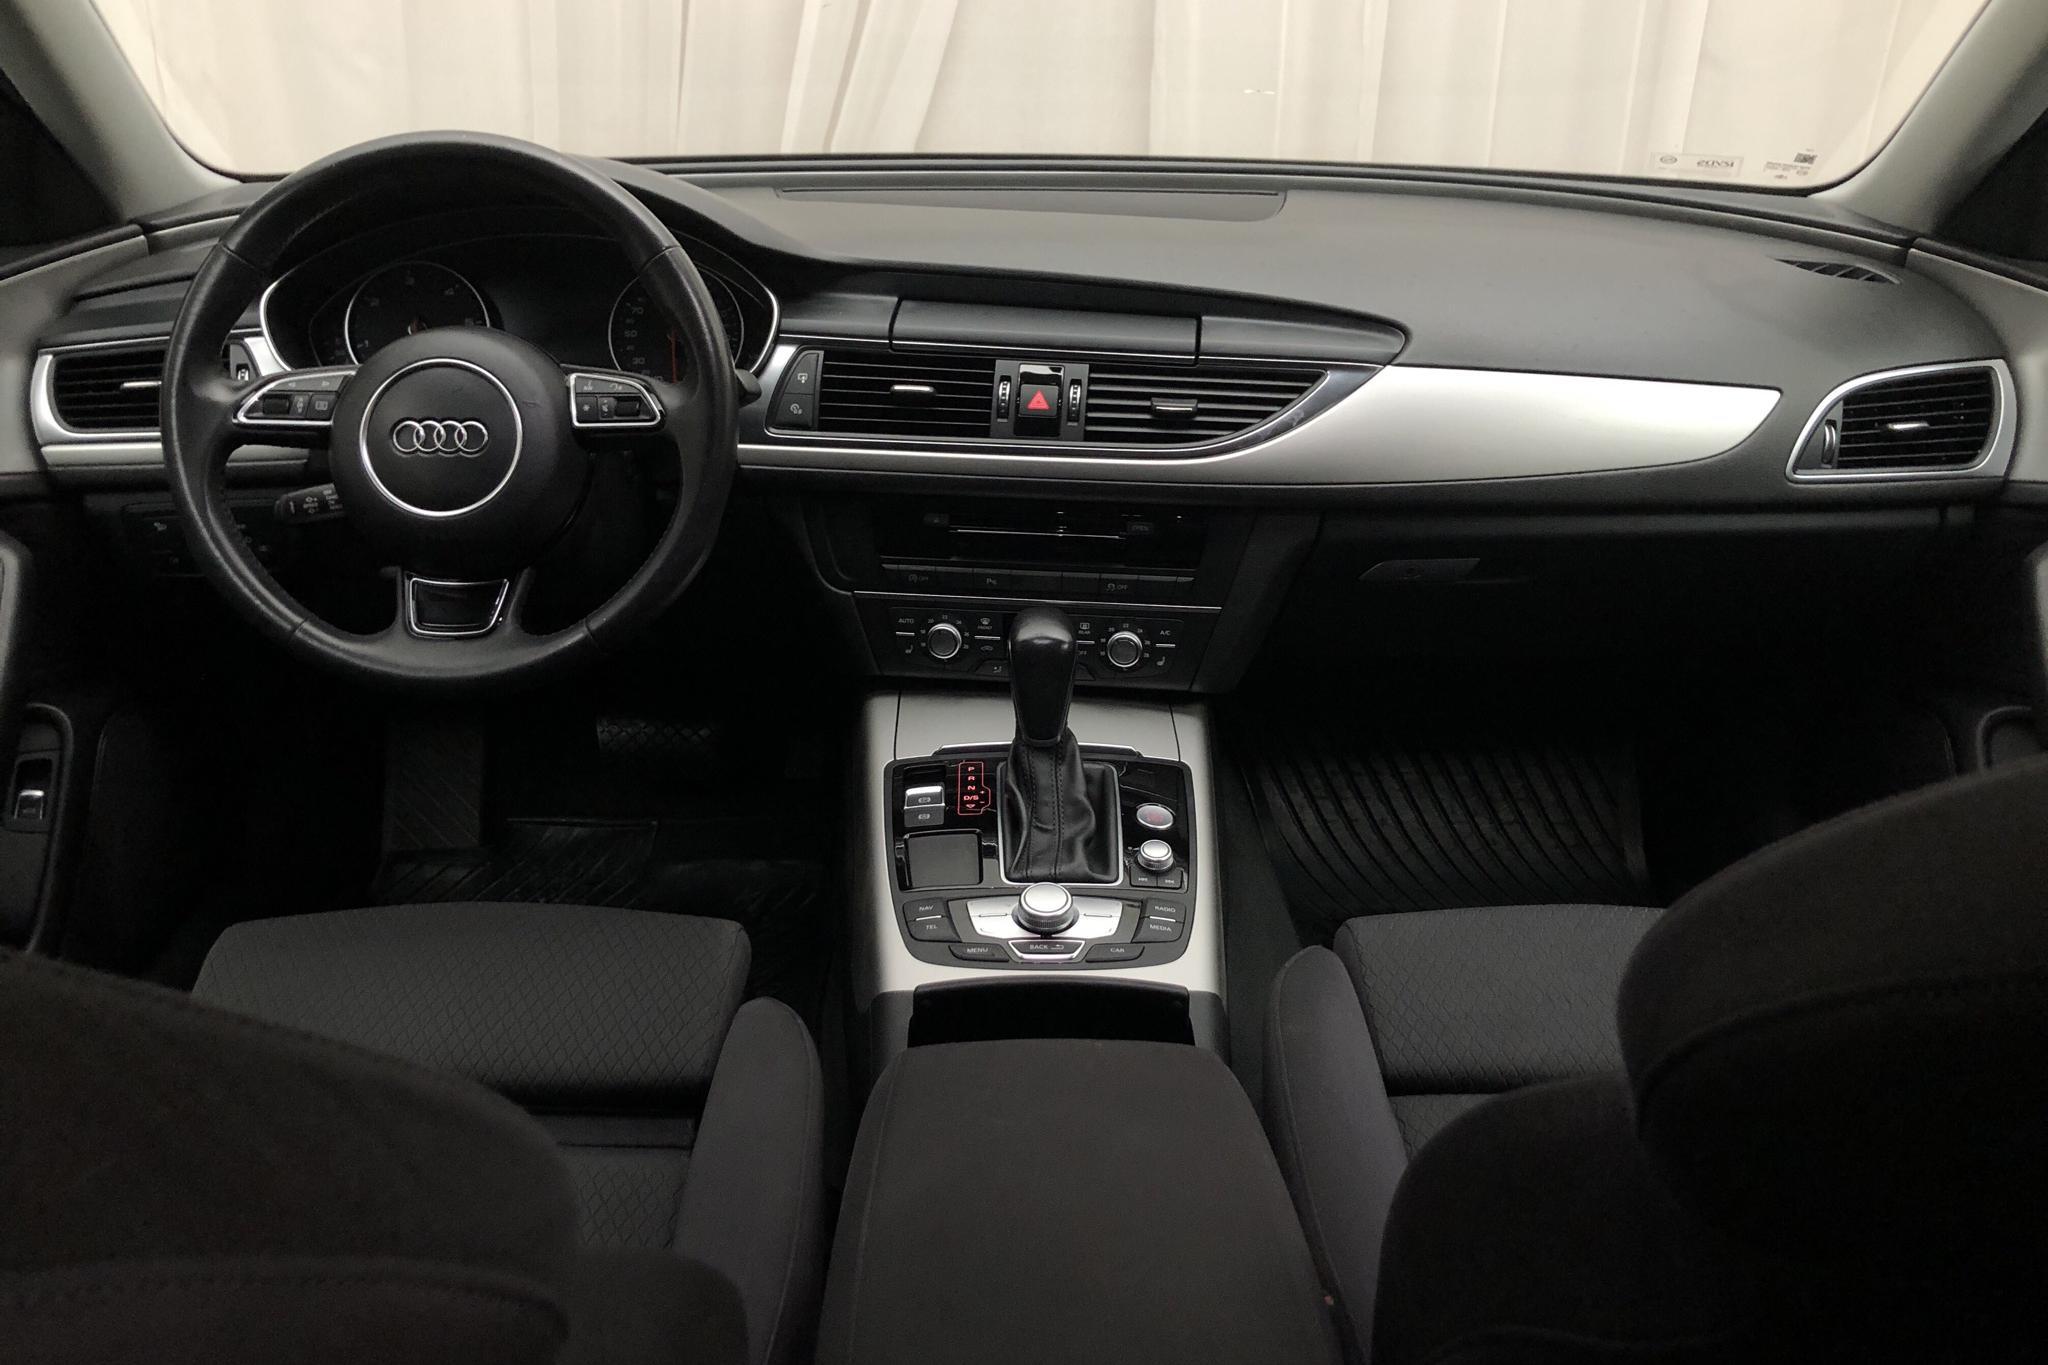 Audi A6 2.0 TDI Avant (190hk) - 195 530 km - Automatic - black - 2018